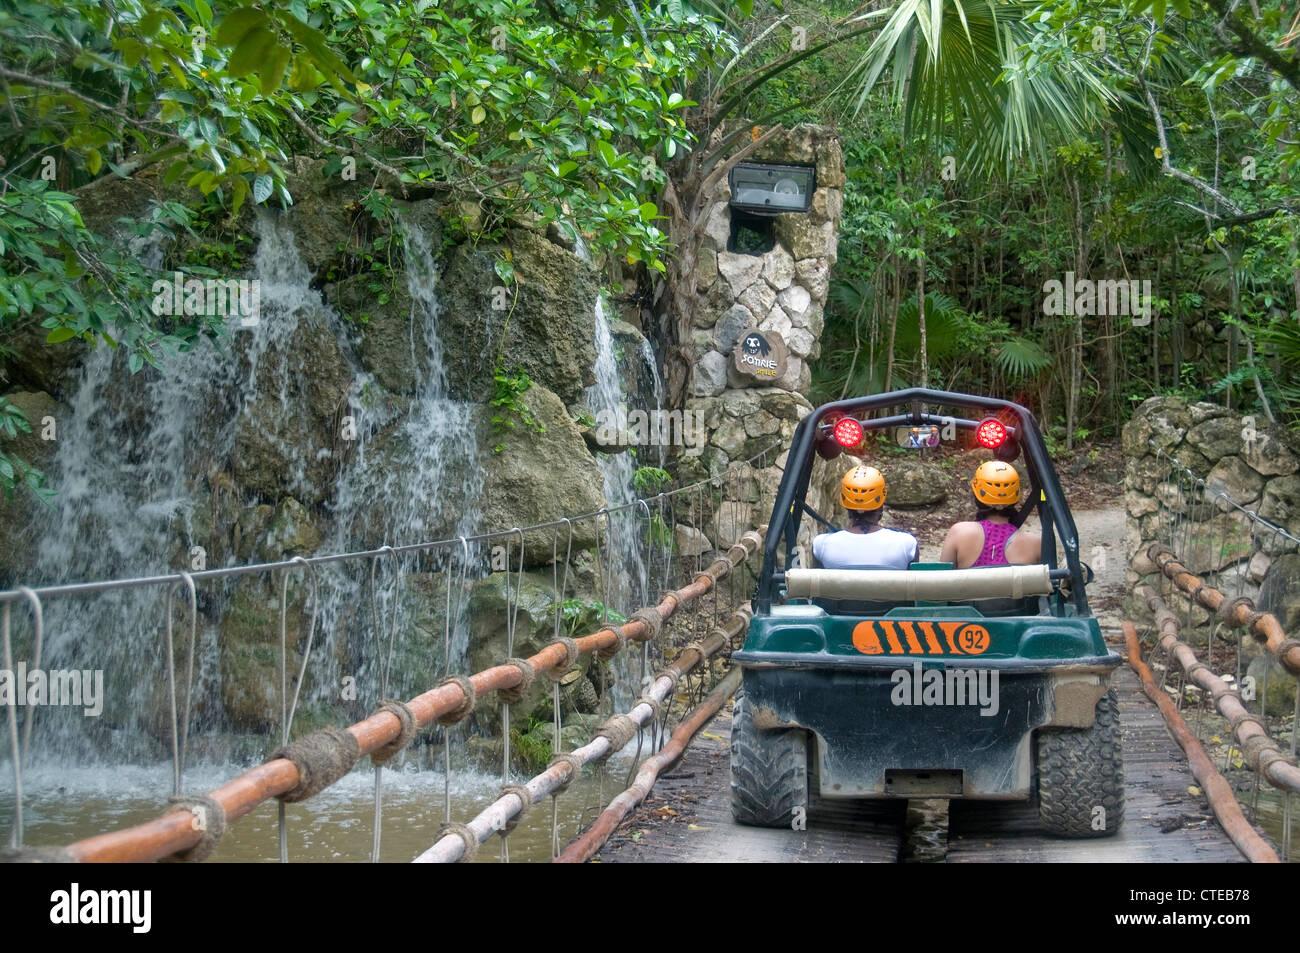 Xplor Park Visitors Enjoy The Wild ATV Rides Through Cenotes Caves And Caverns In Mexicos